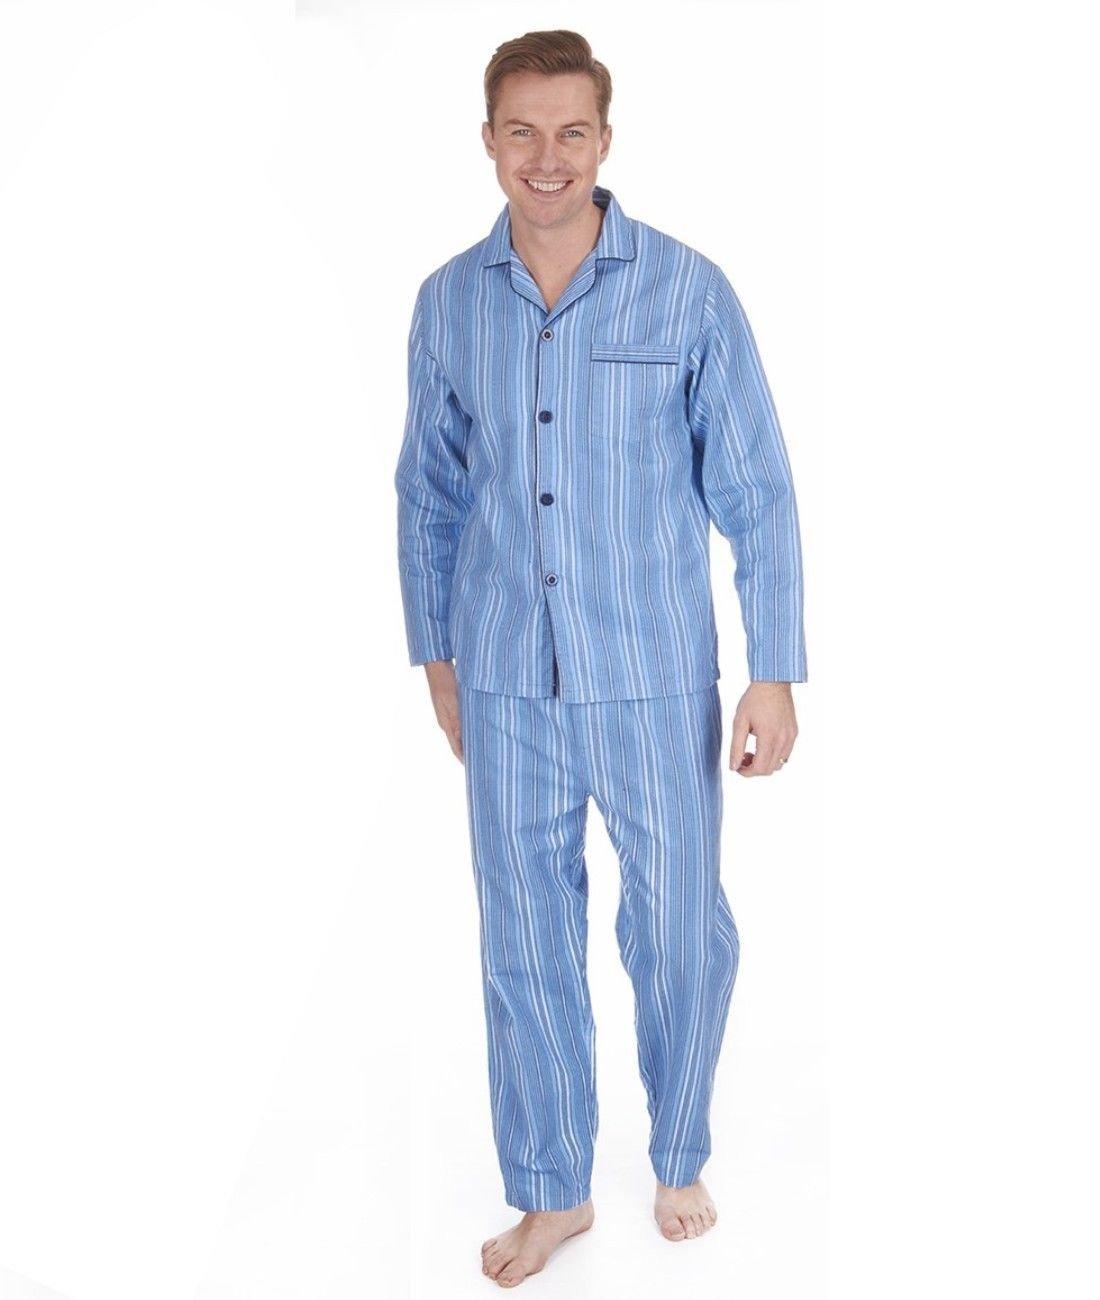 Hombre Perchado 100% pura% Pijama De Algodón Cálido De Invierno Franela Térmico M L XL